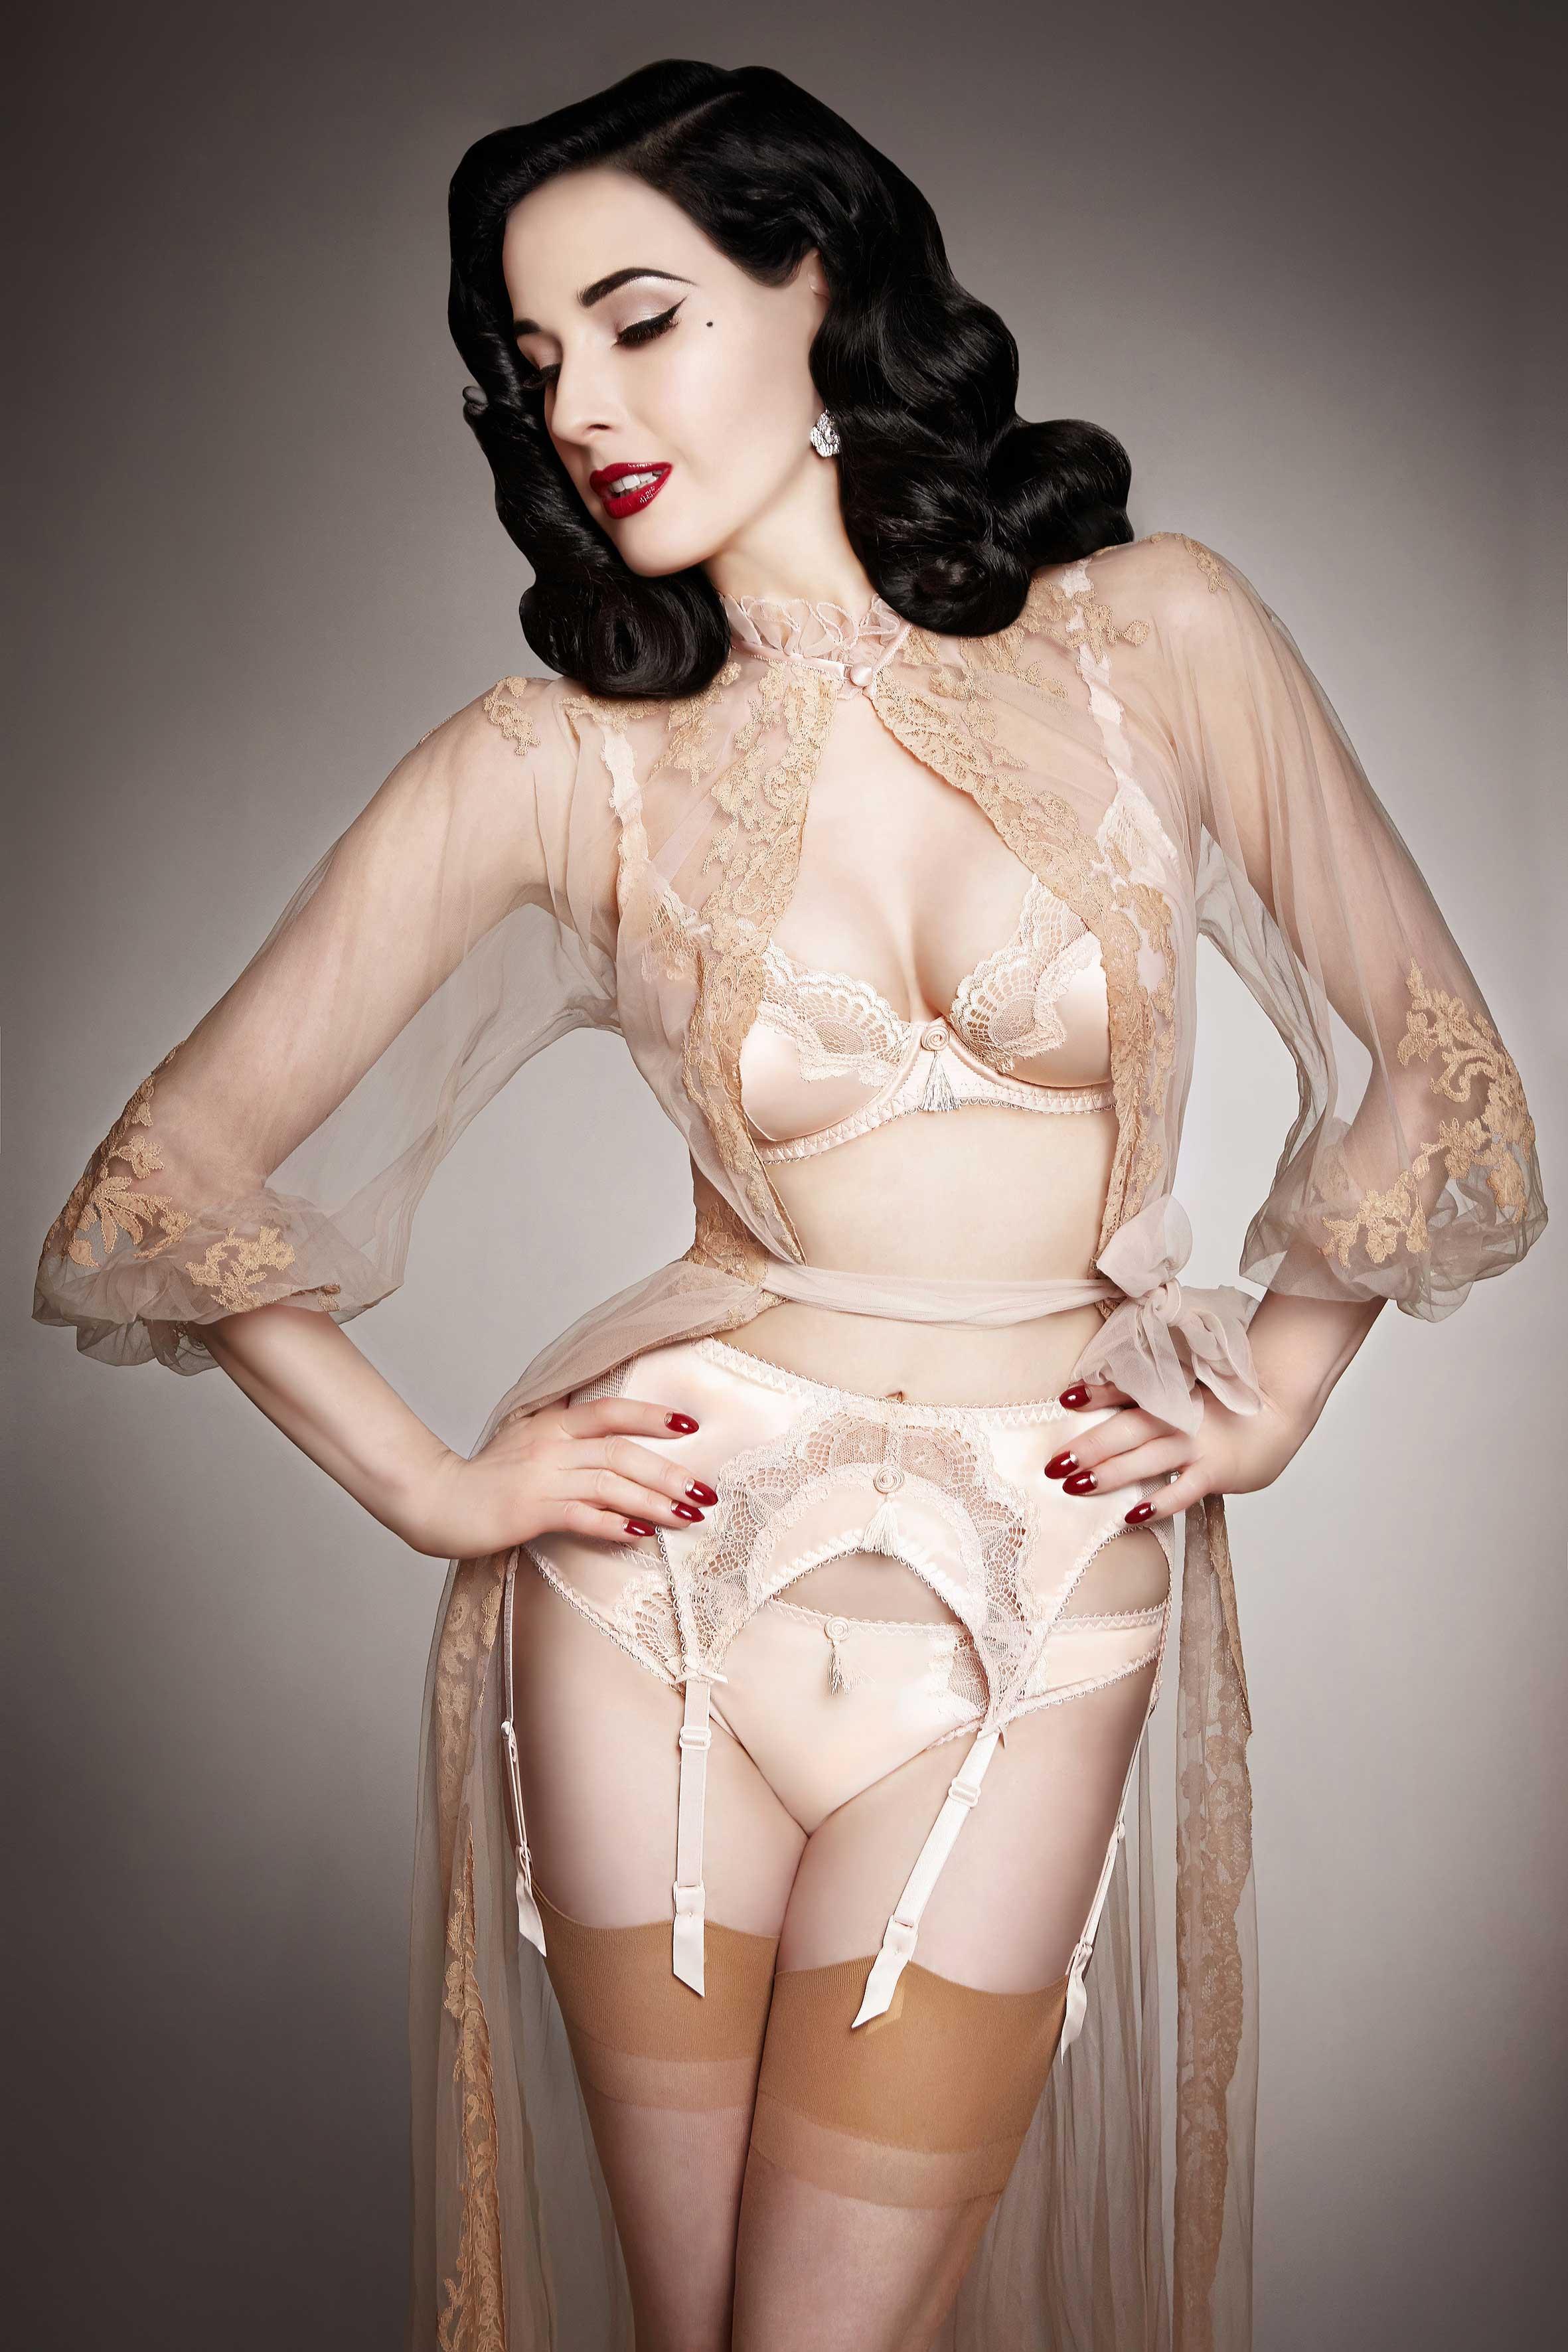 277052_Dita_Von_Teese_lingerie_Star_Lift_vintage_peach